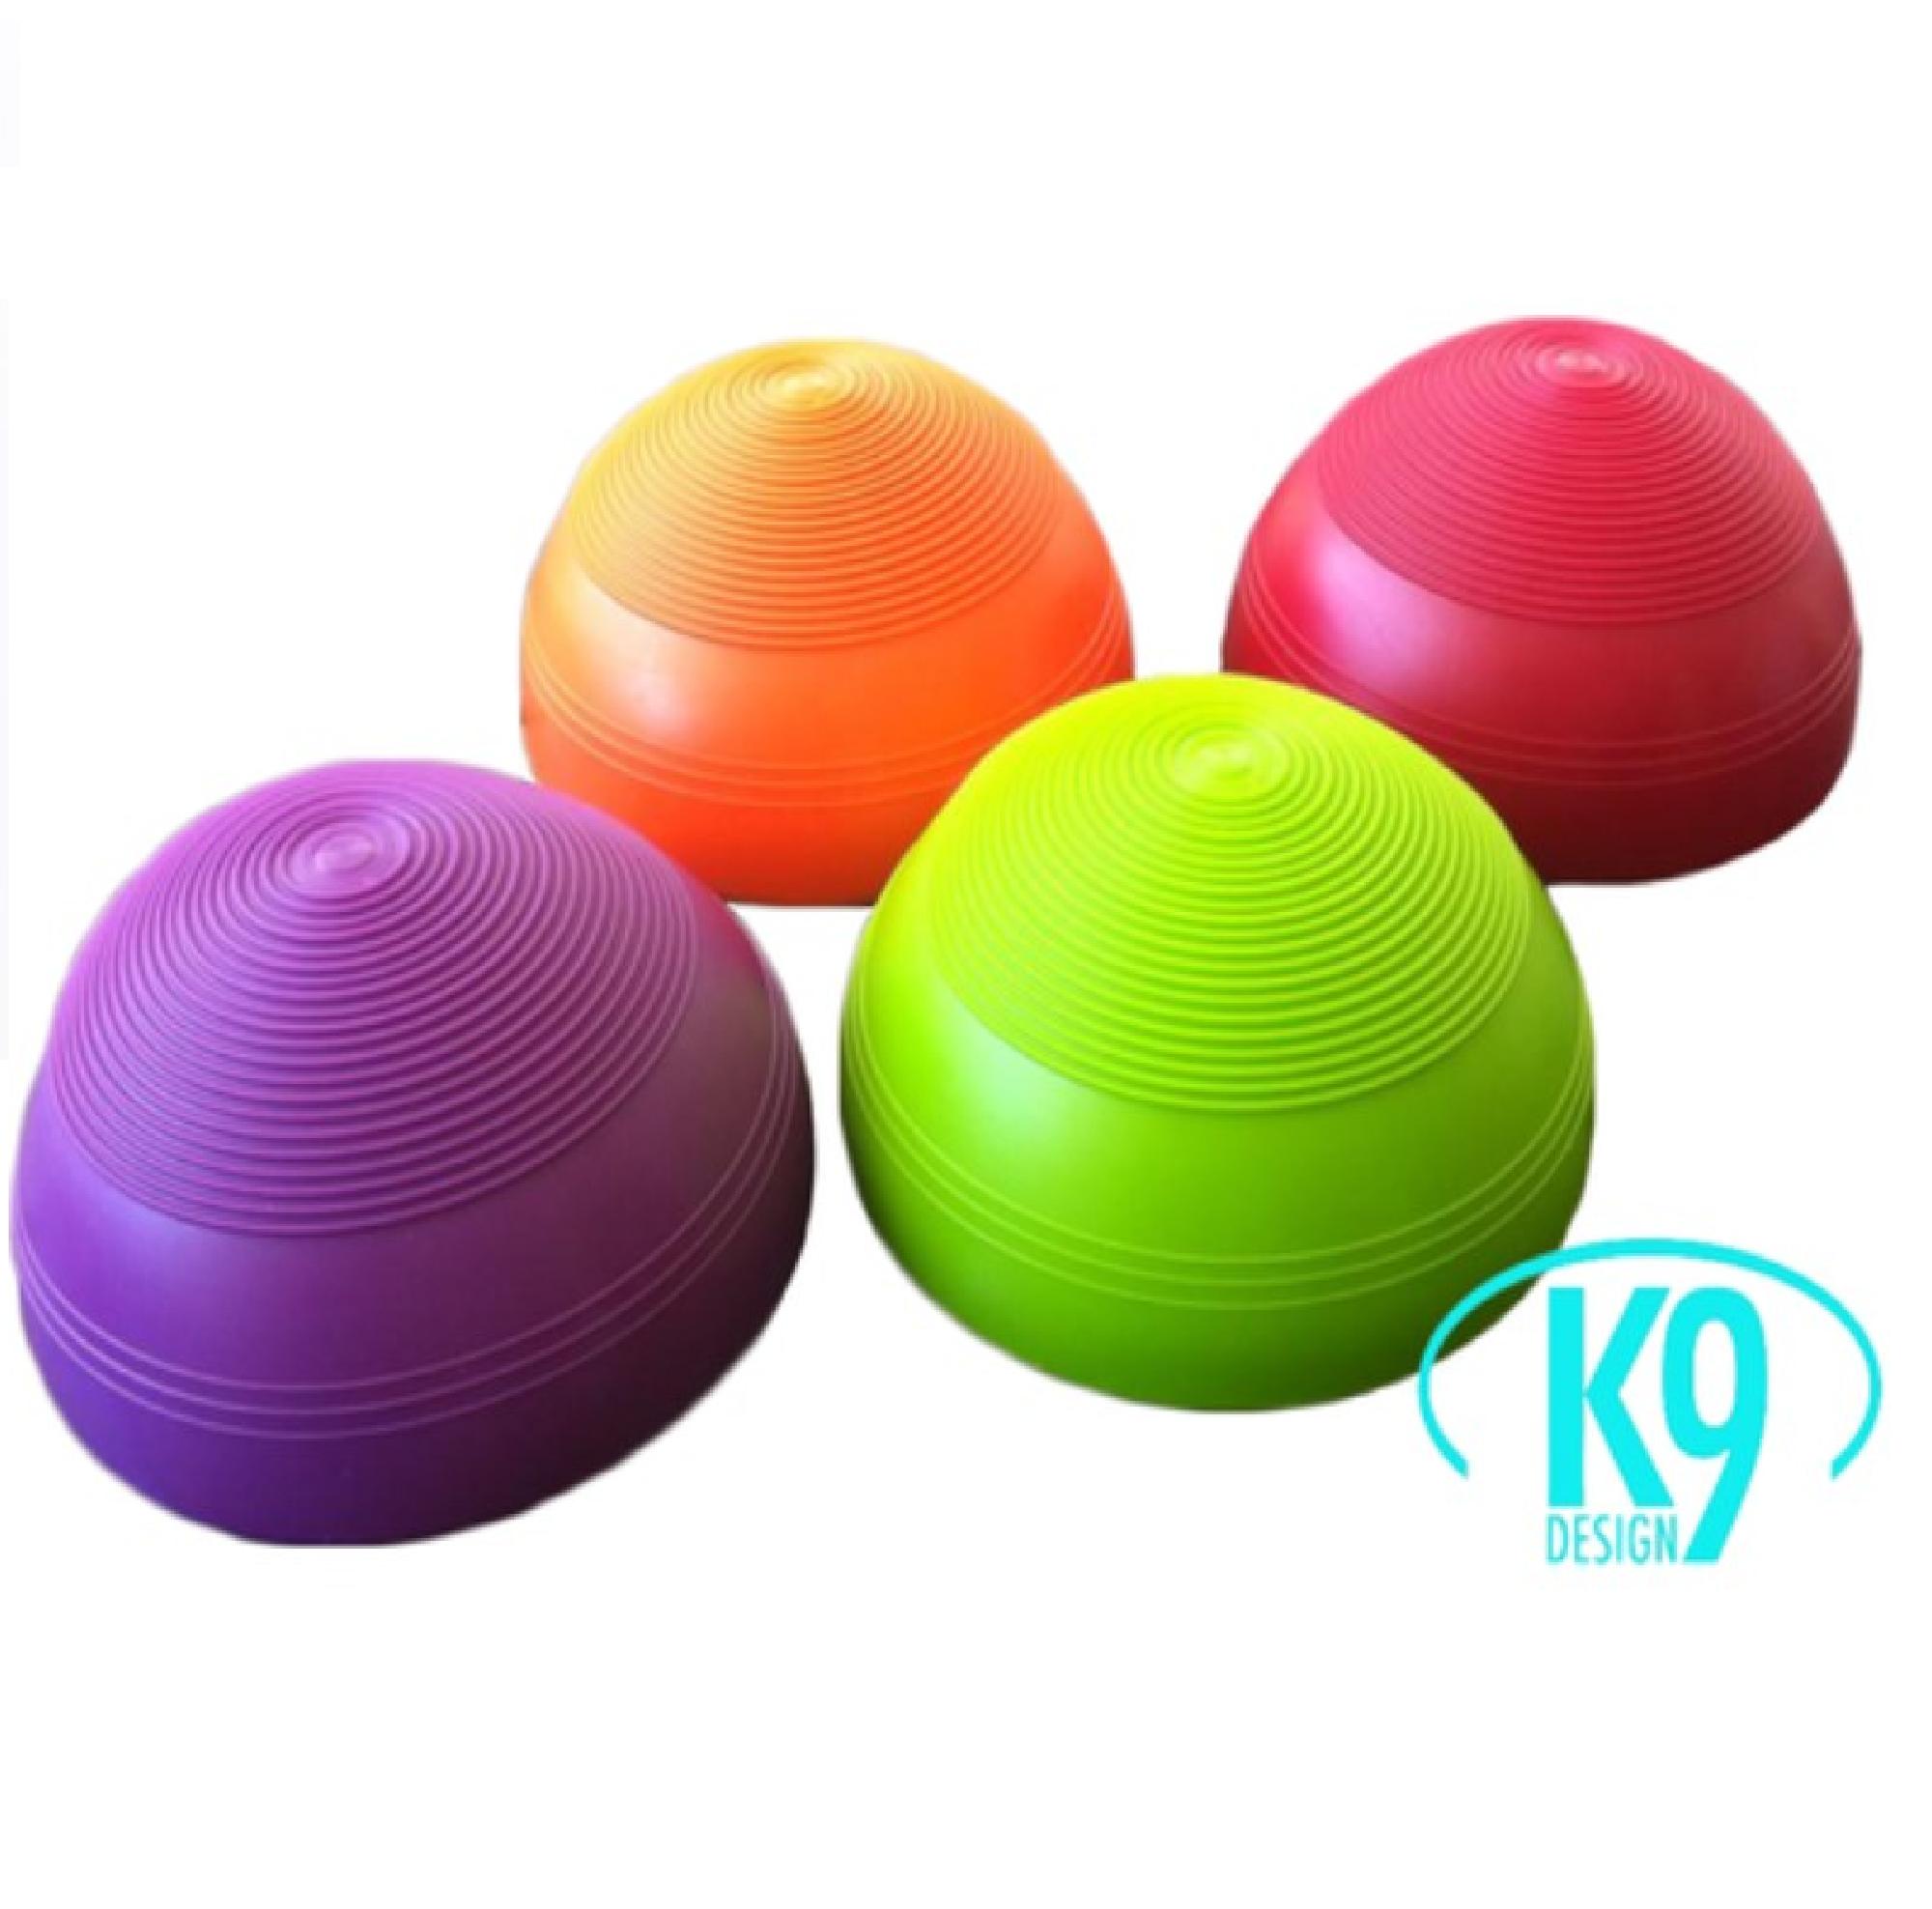 K9 Design Halvboll Balans